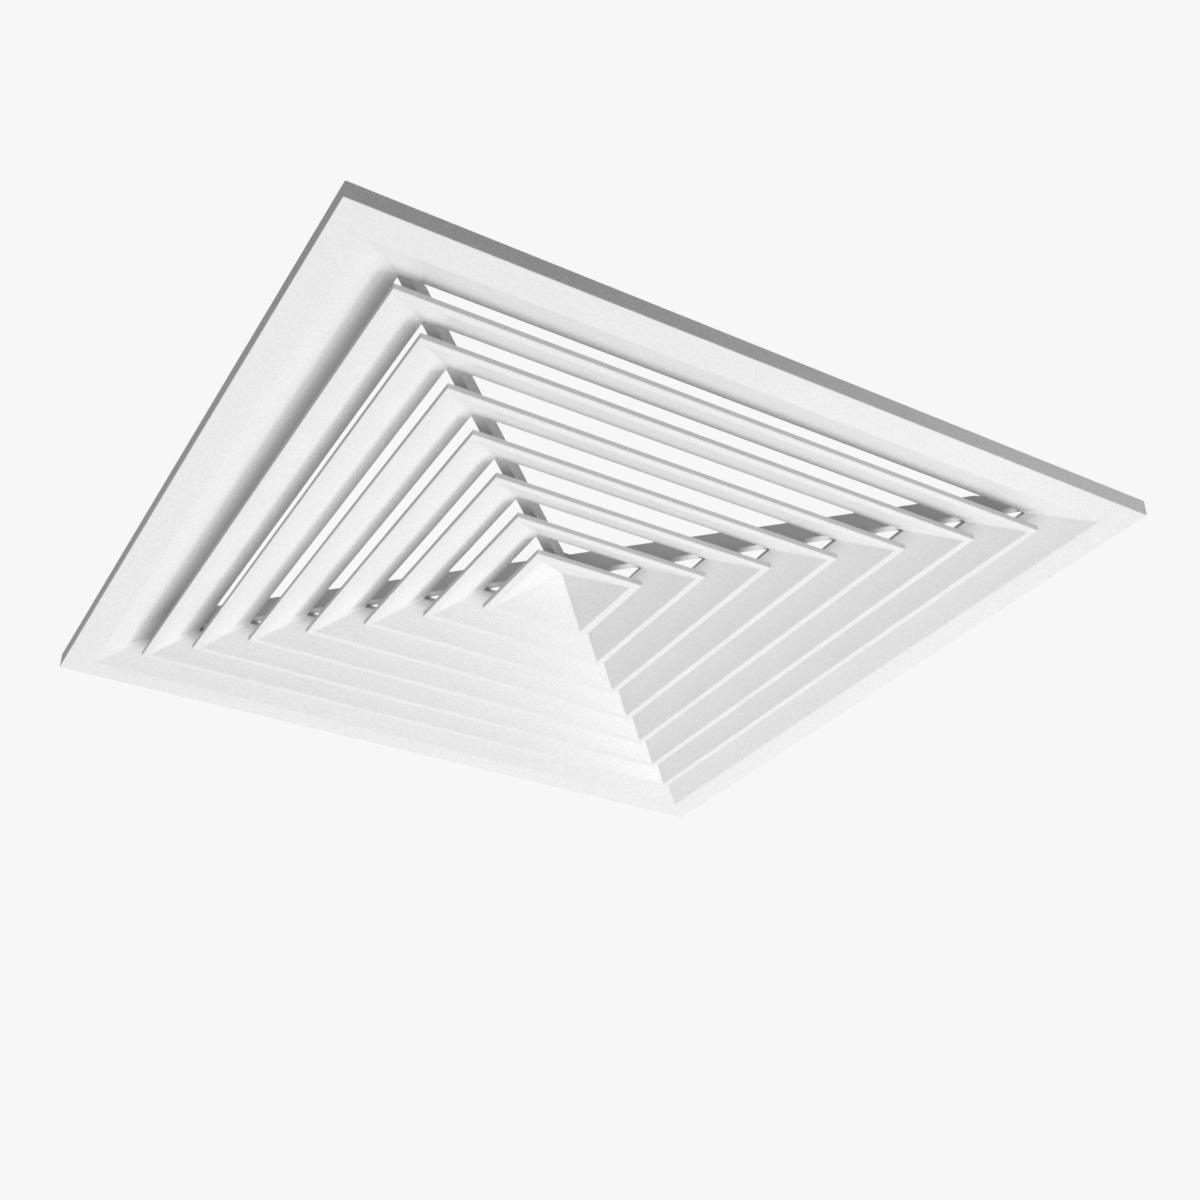 Ceiling Ventilation 3d Model Ad Ceiling Ventilation Model